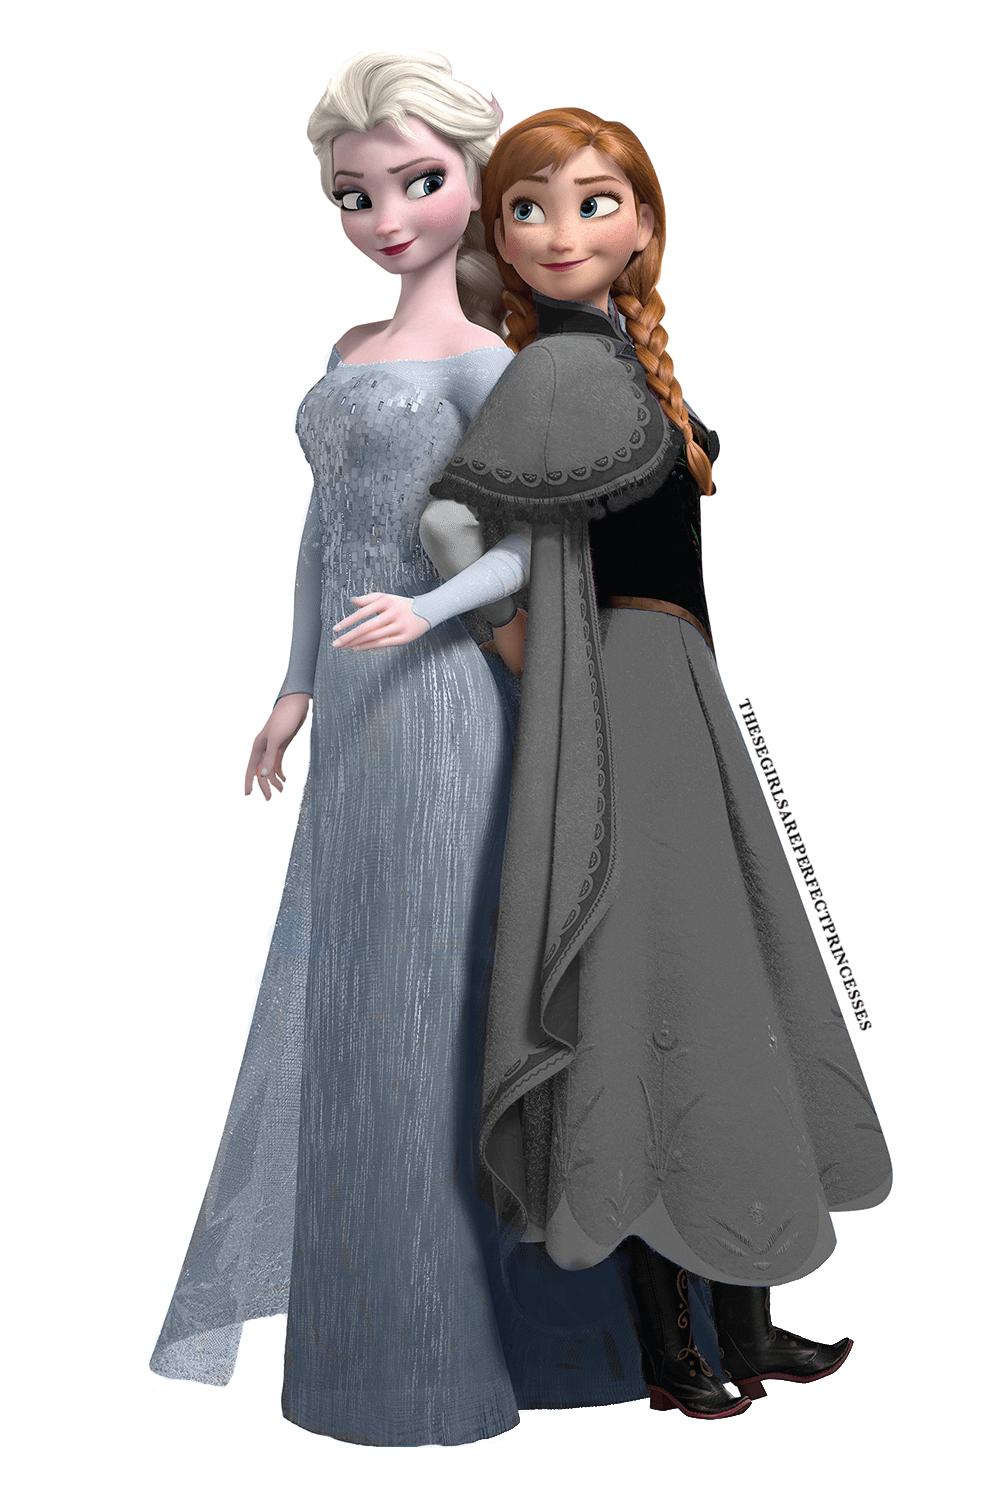 Transparent Princesses match your blog  Disney Will Thaw